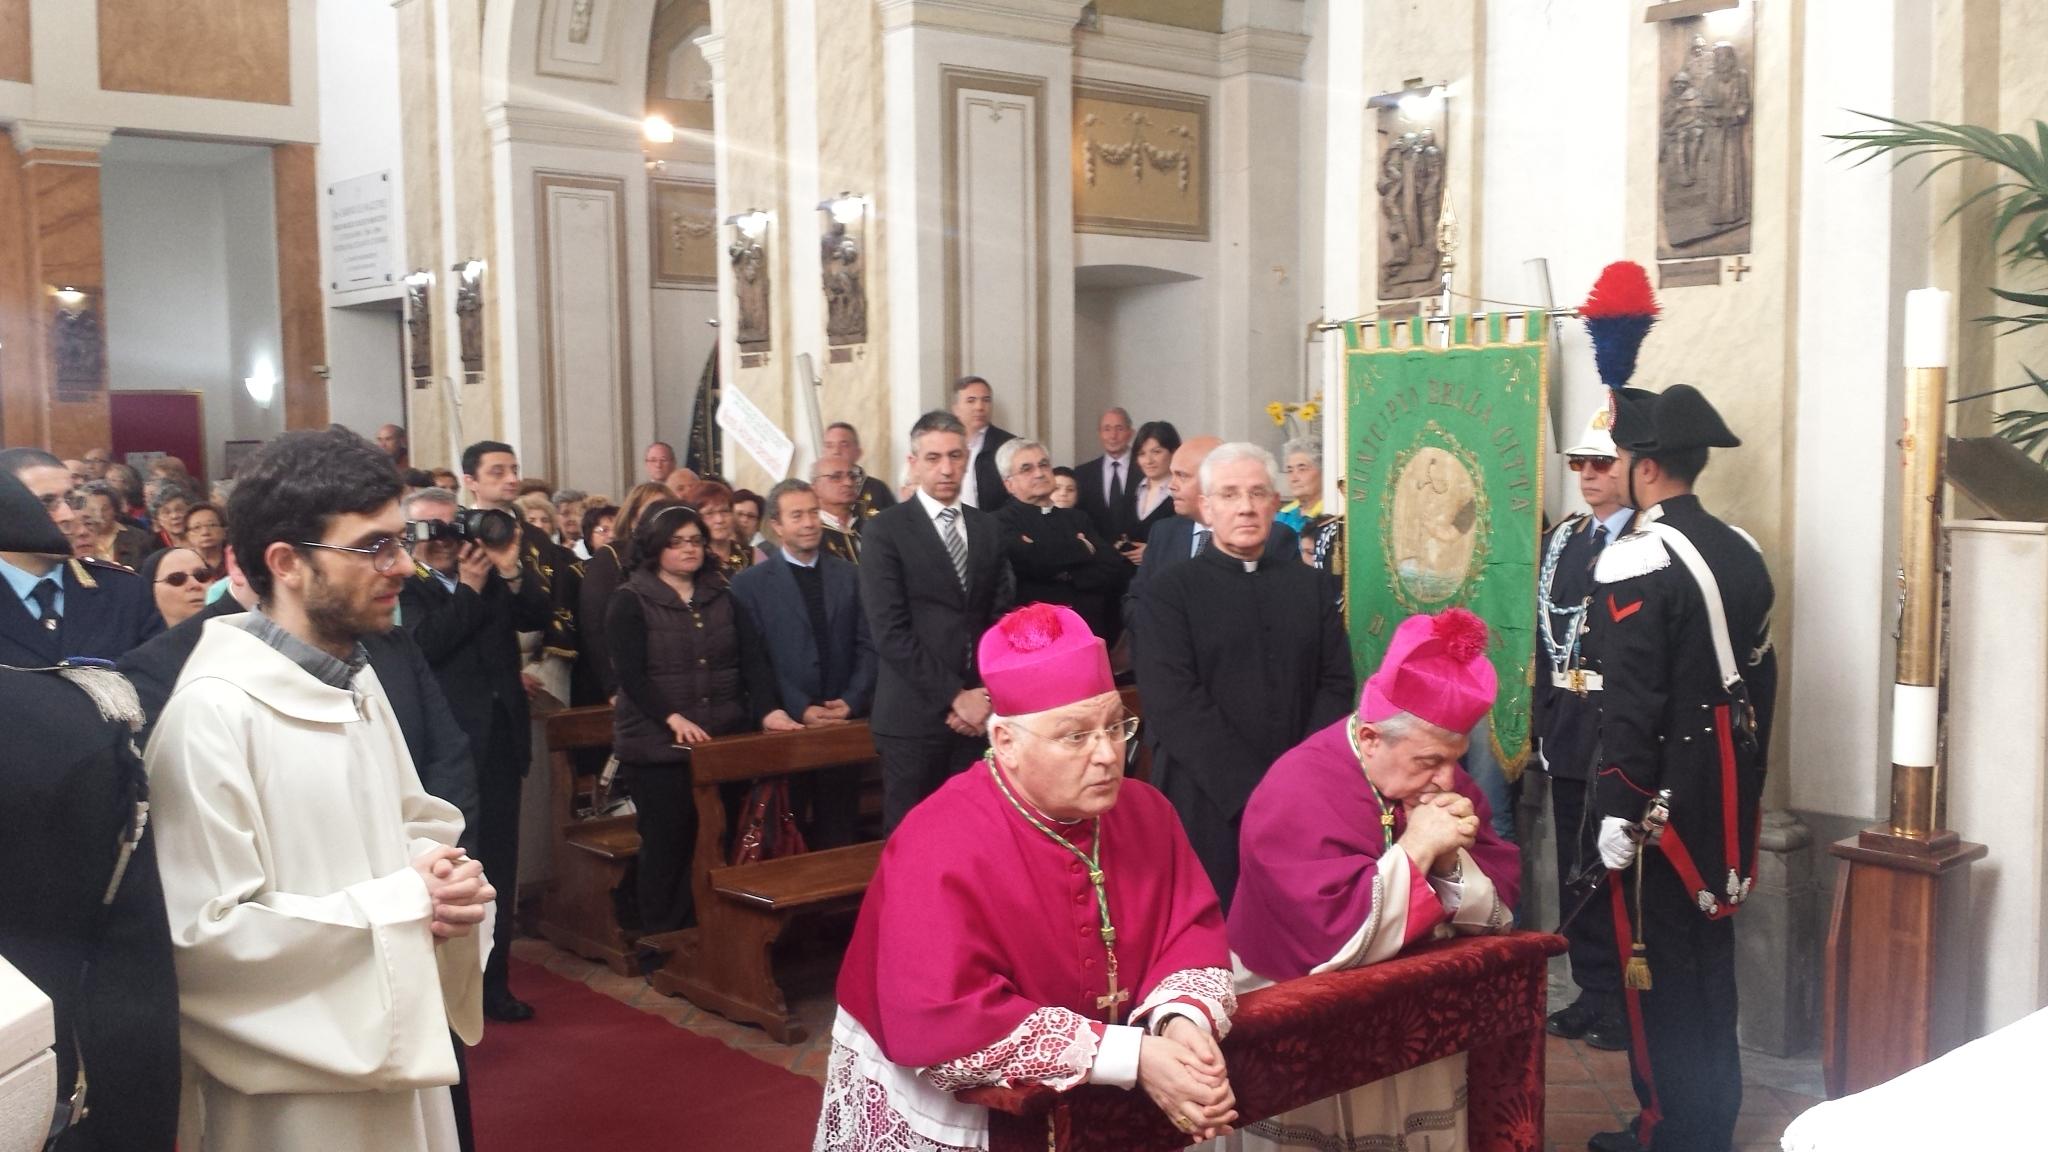 Nunzio Bernardini